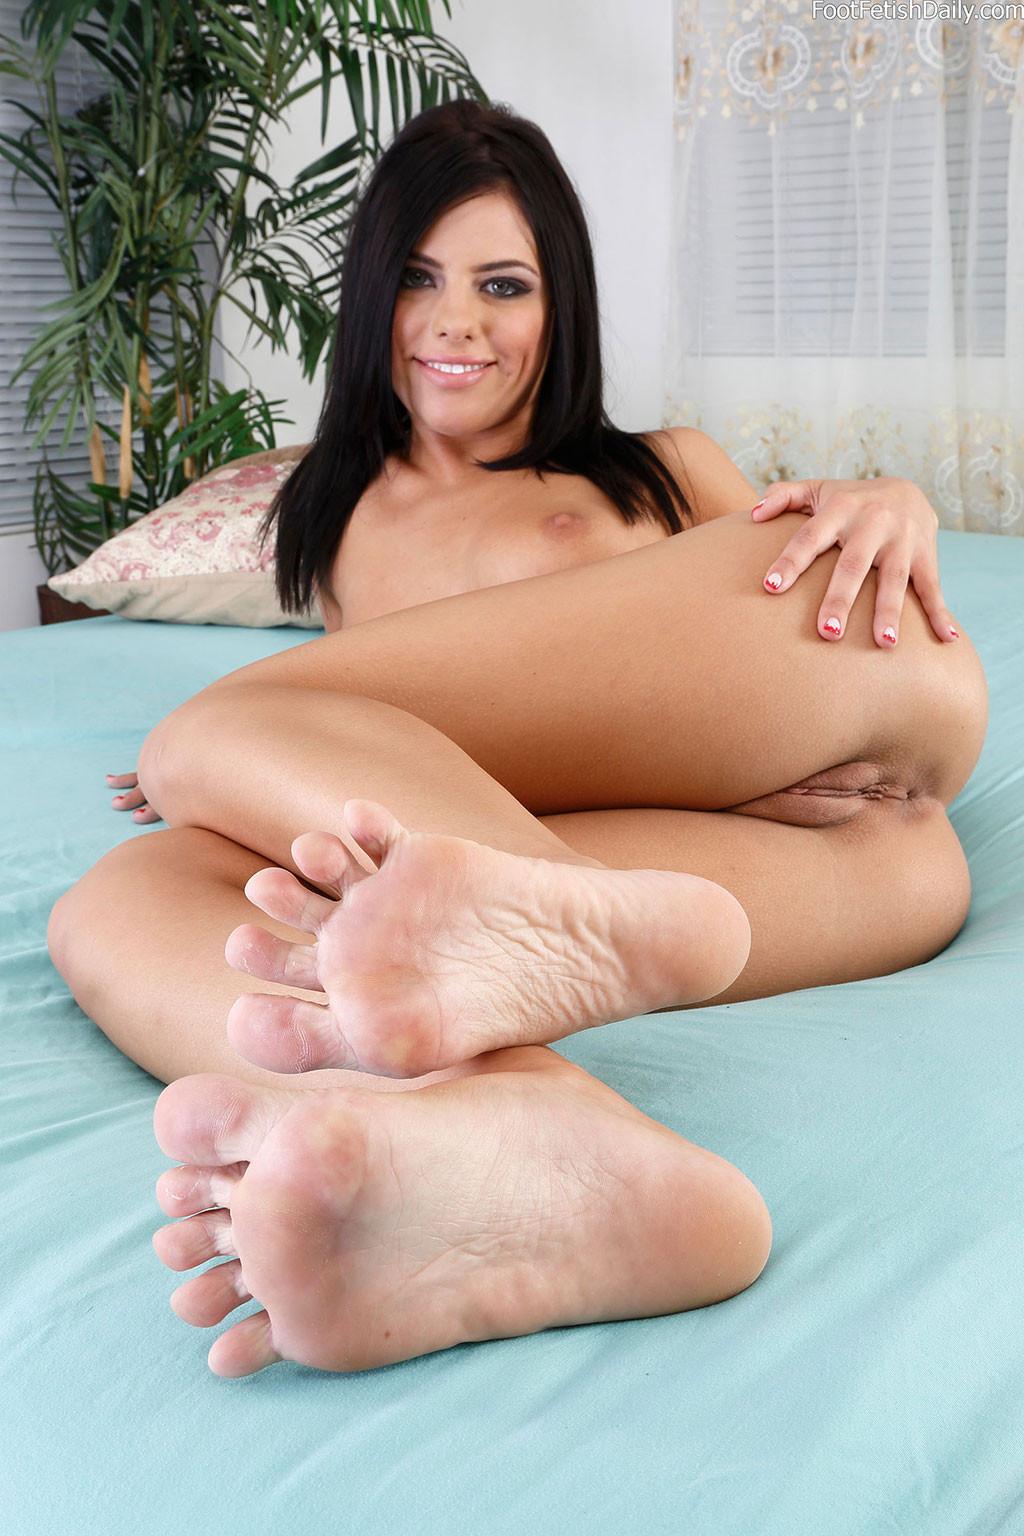 16 twinks gay porn